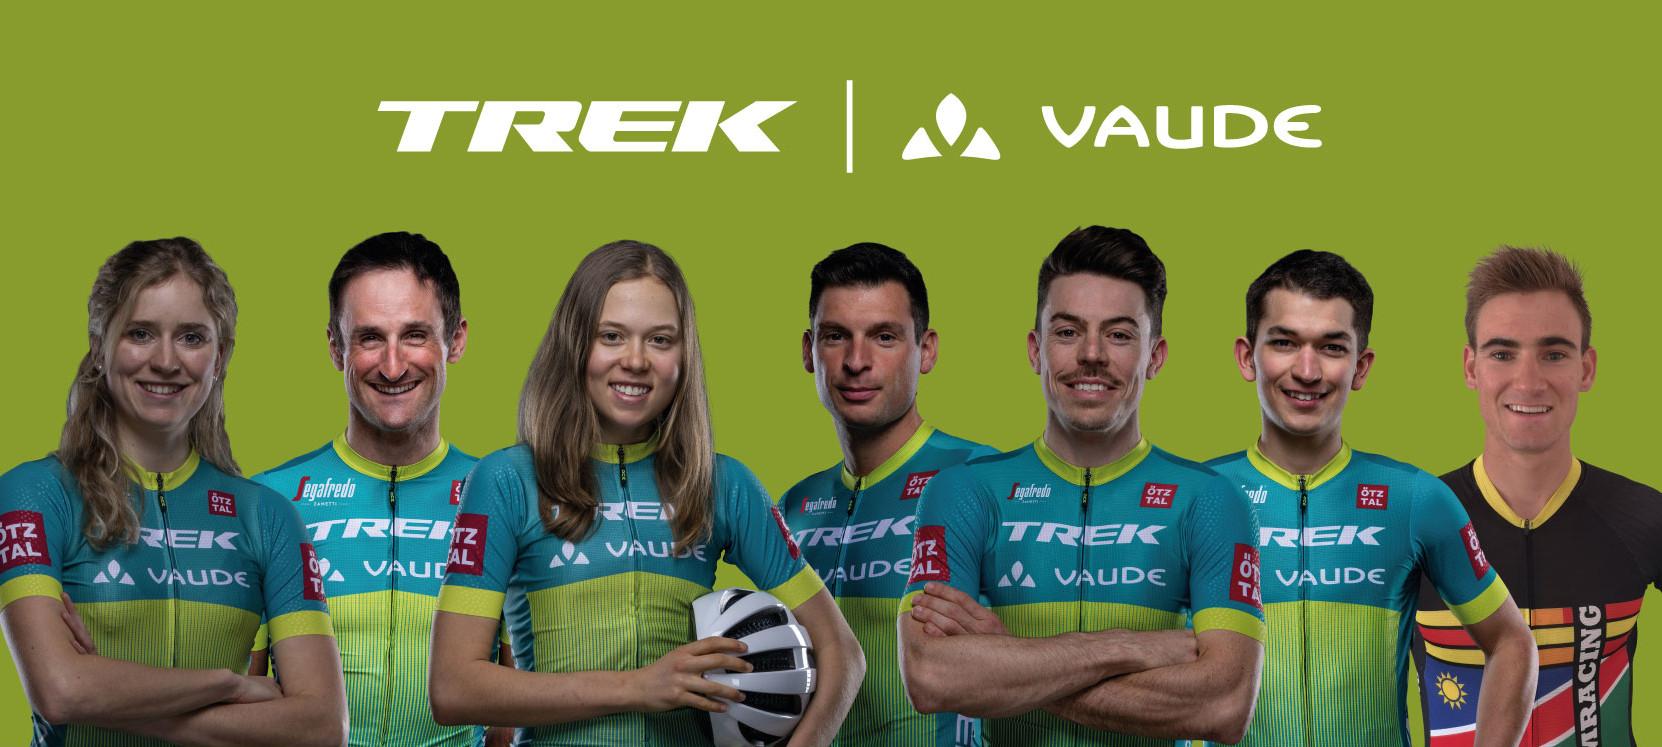 Team TREK | VAUDE